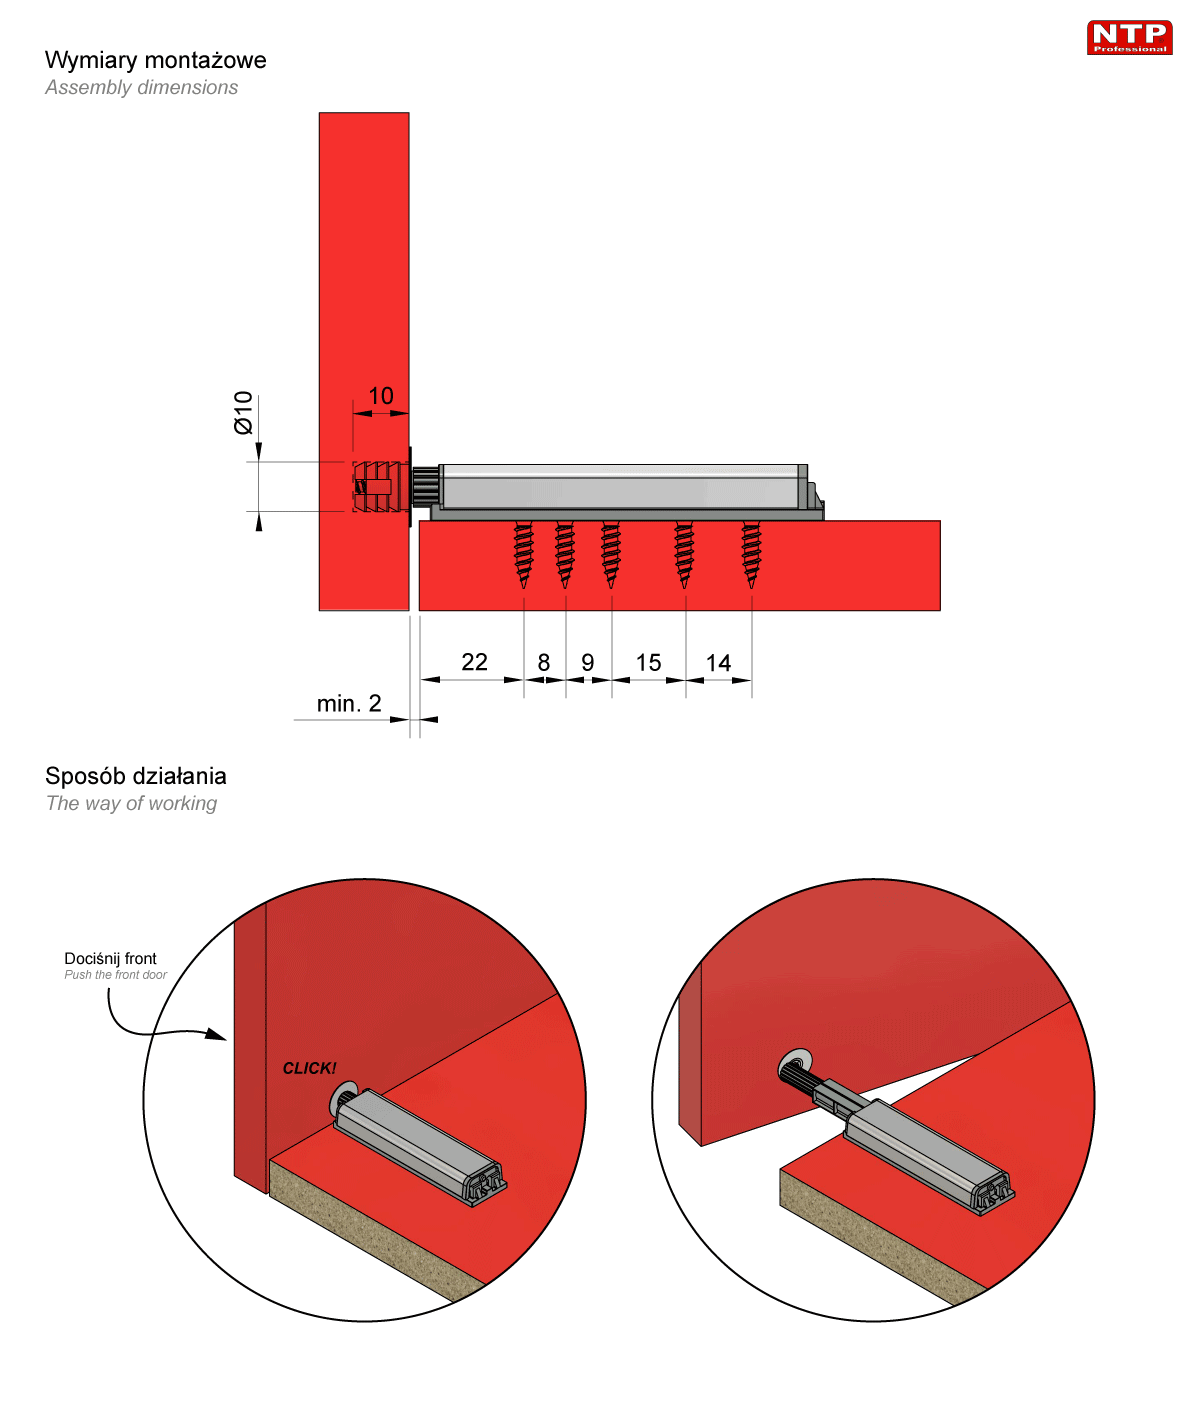 zatrzask z magnesem (tip-on) rysunek techniczny